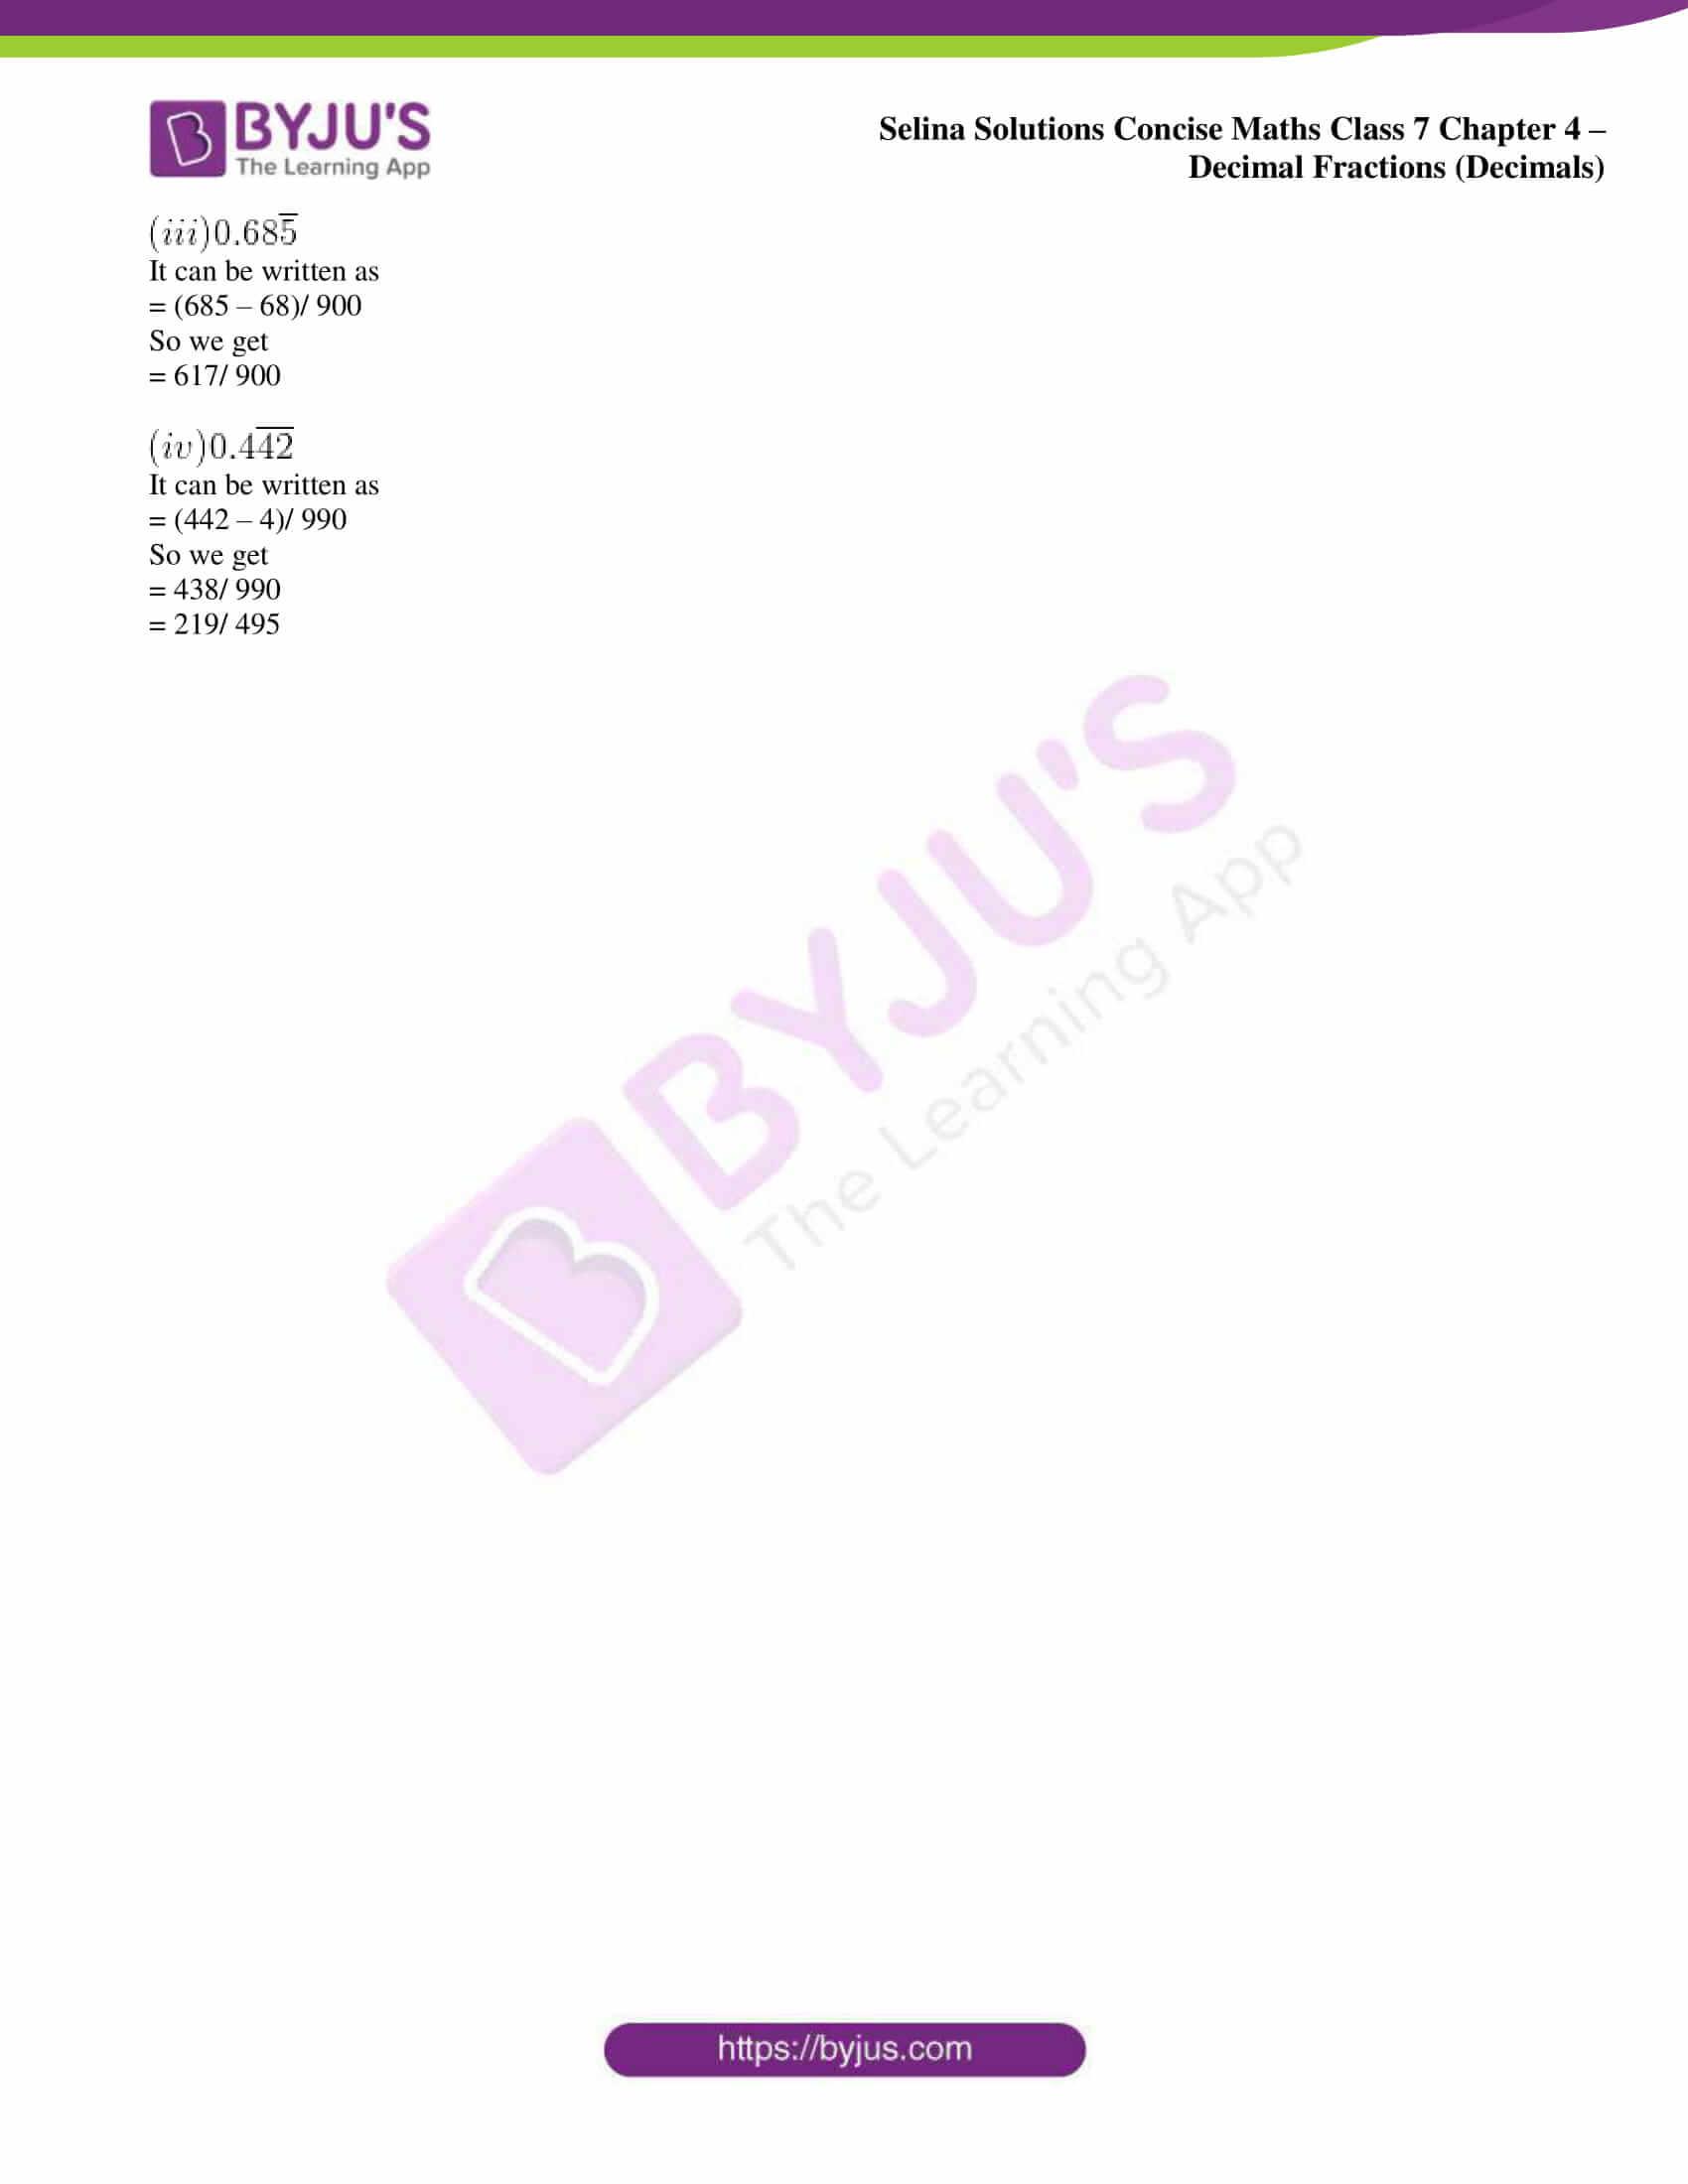 selina sol concise maths class 7 ch4 ex 4d 10